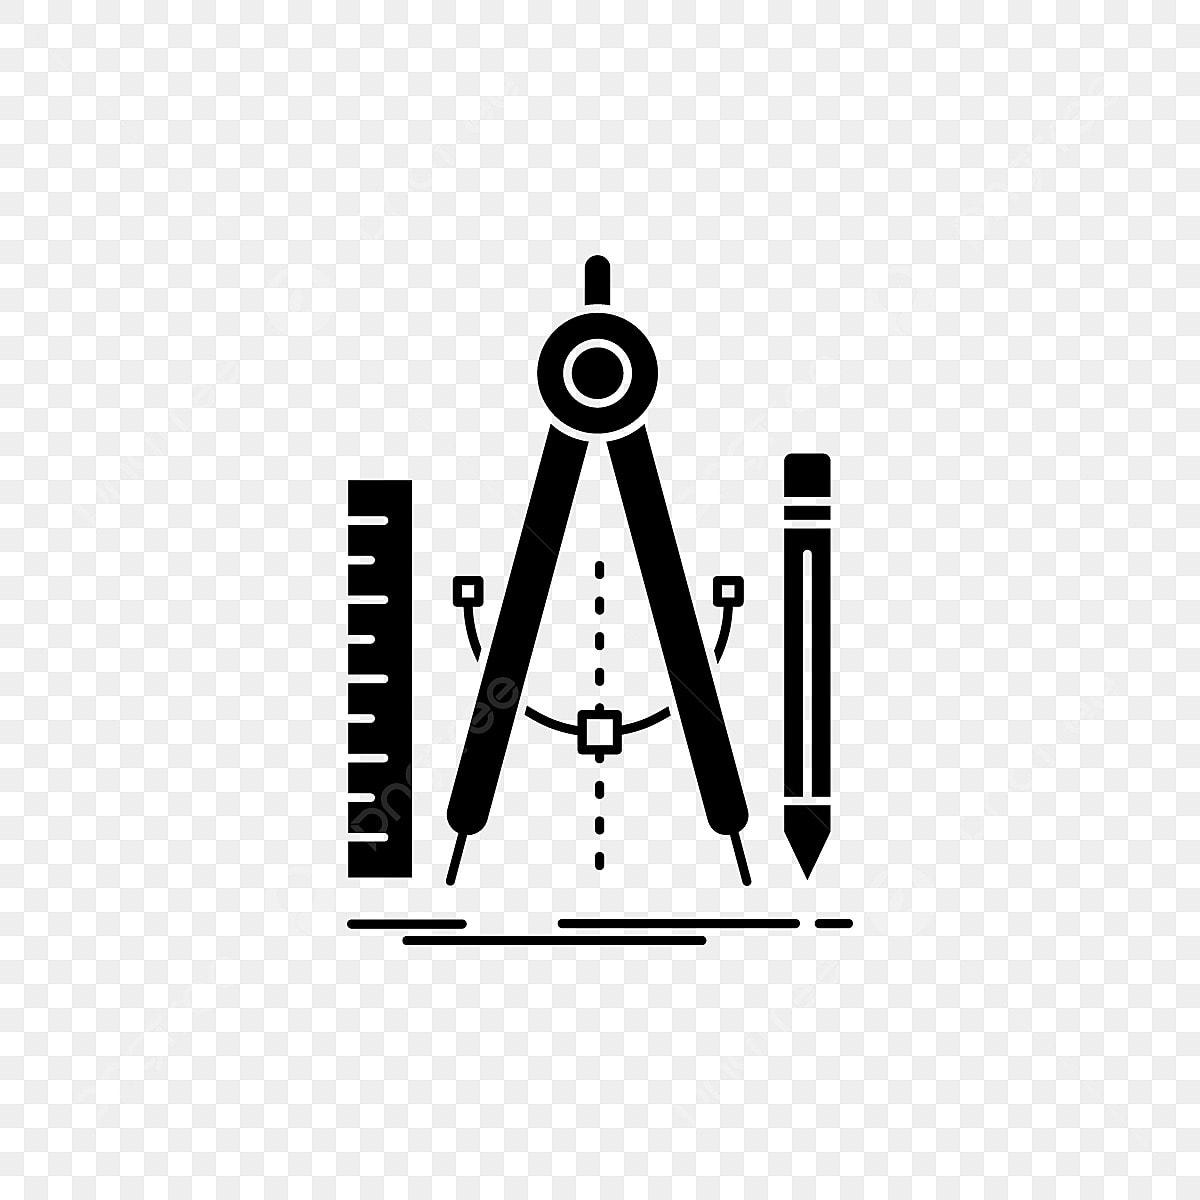 construir dise u00f1o la geometr u00eda matem u00e1ticas herramienta